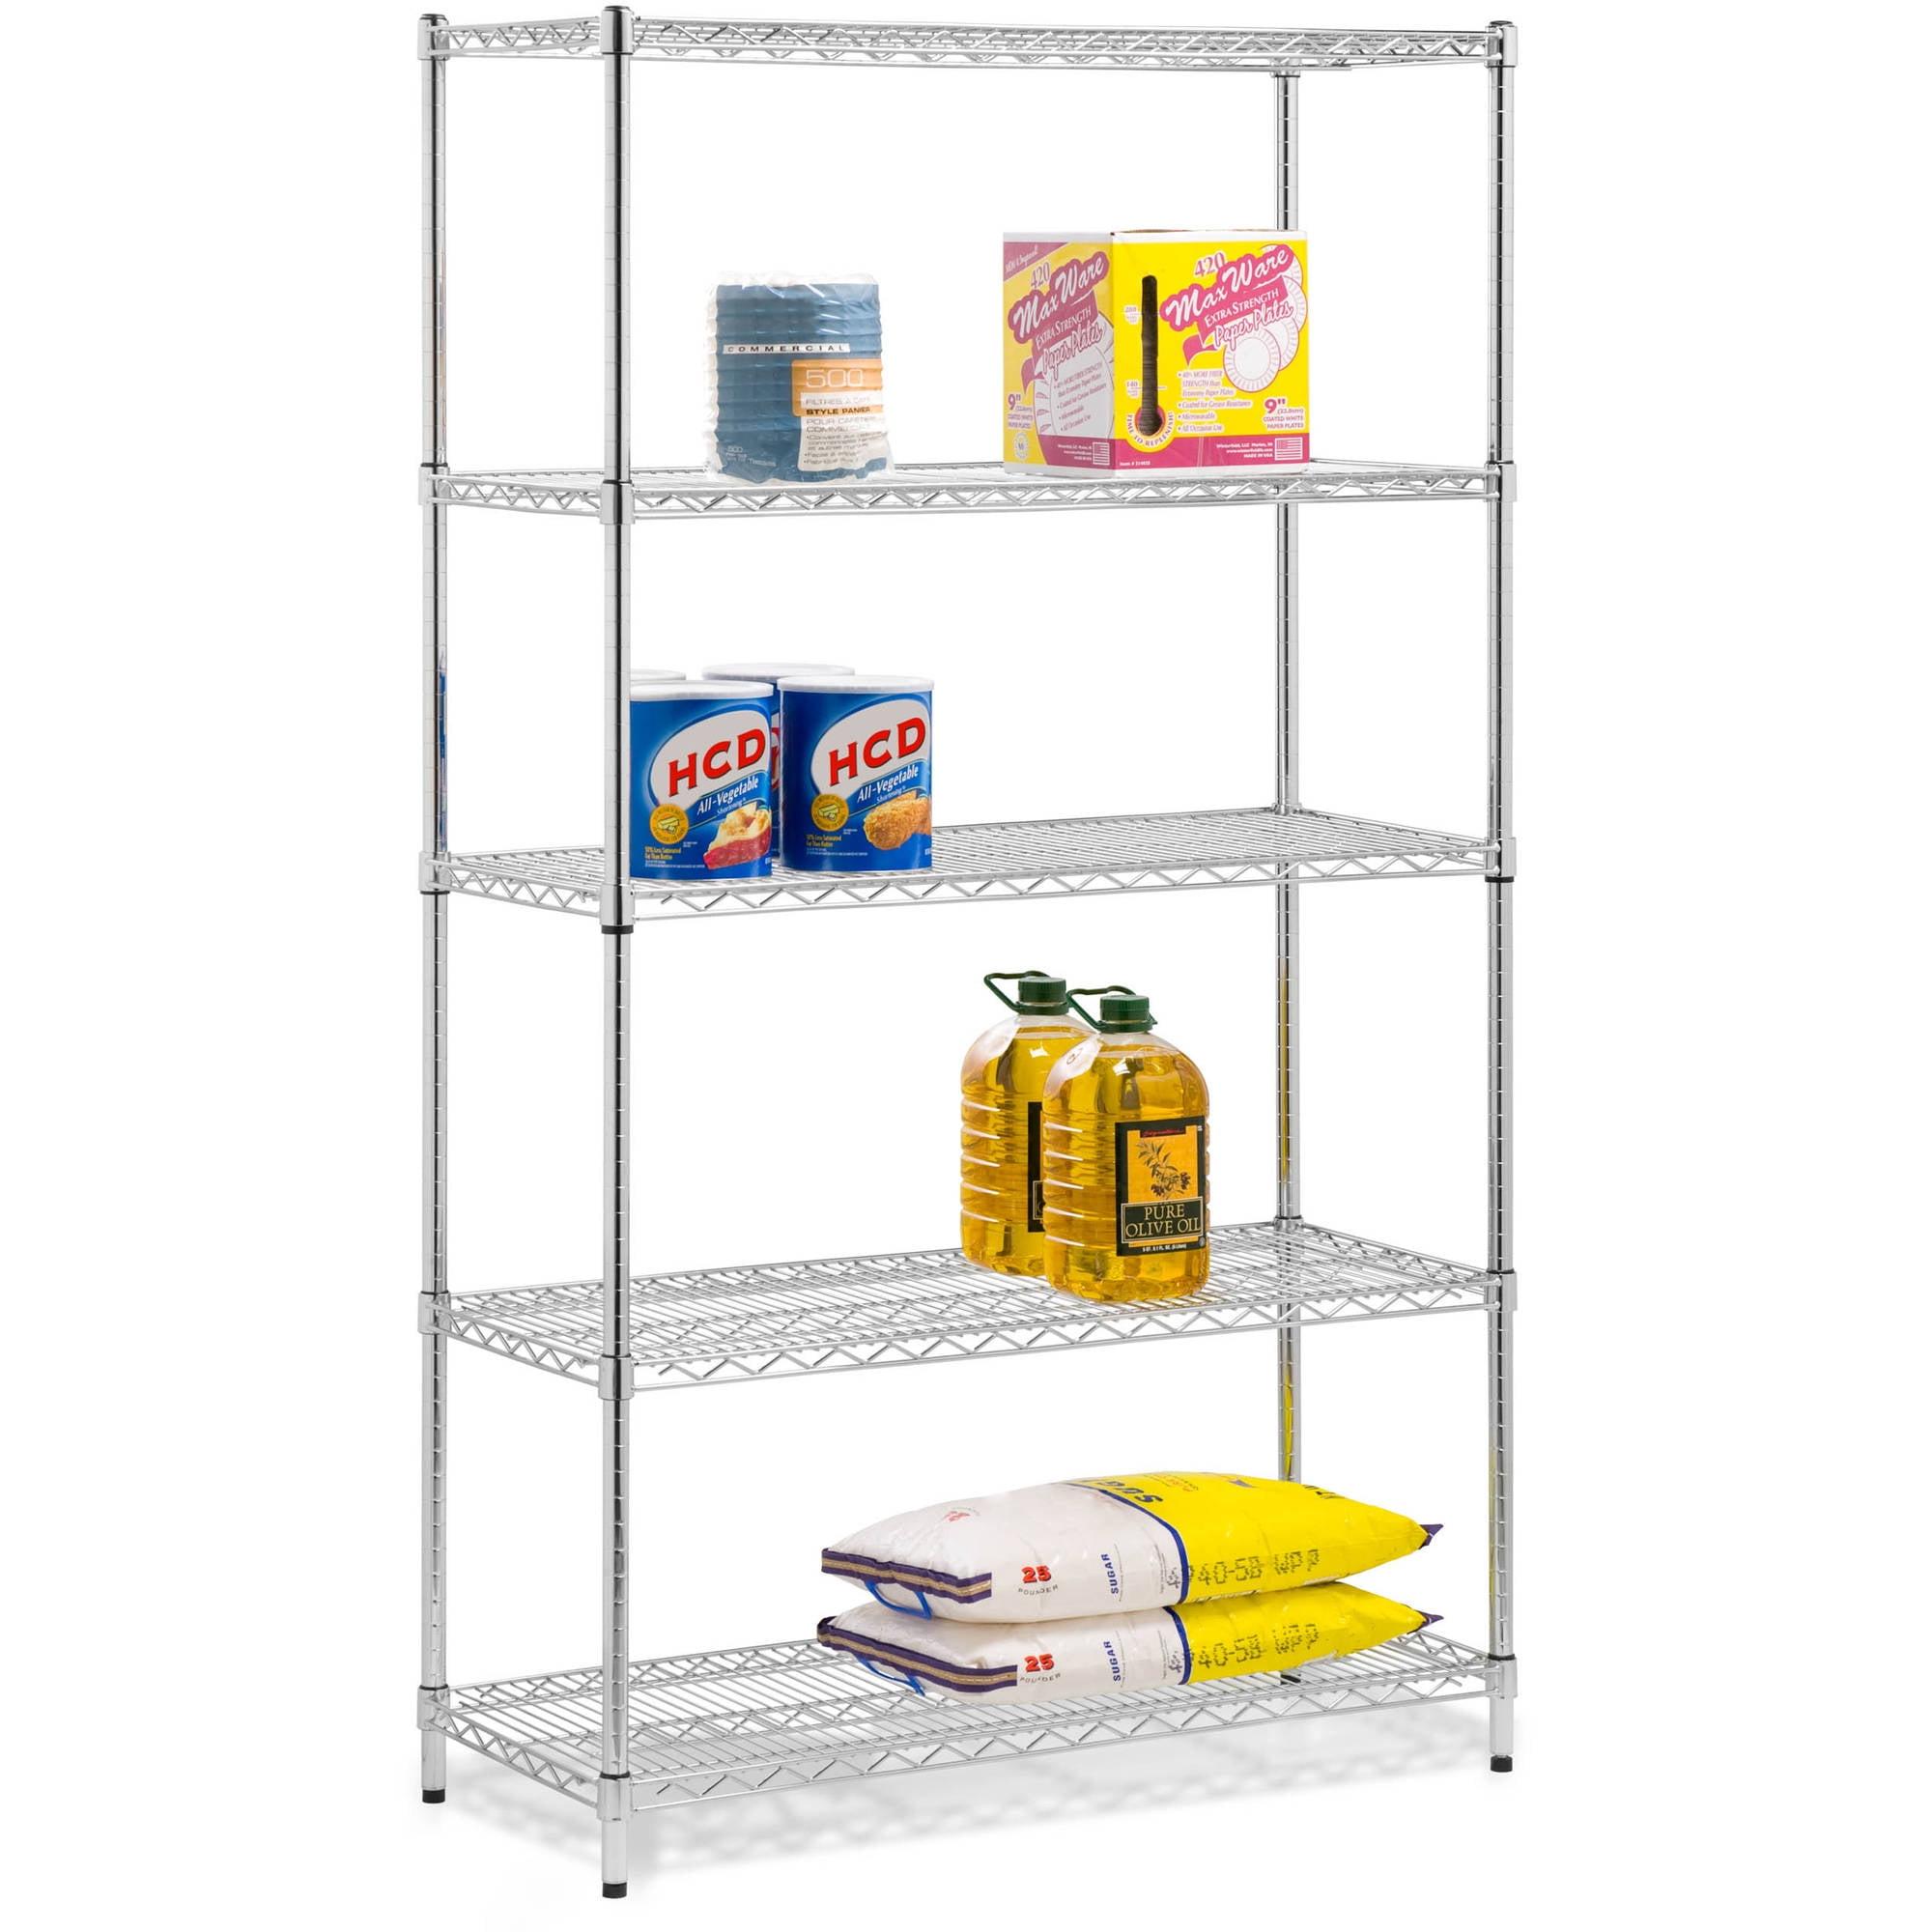 Honey Can Do Urban Shelving 5-Tier Adjustable Storage Shelving Unit, Chrome